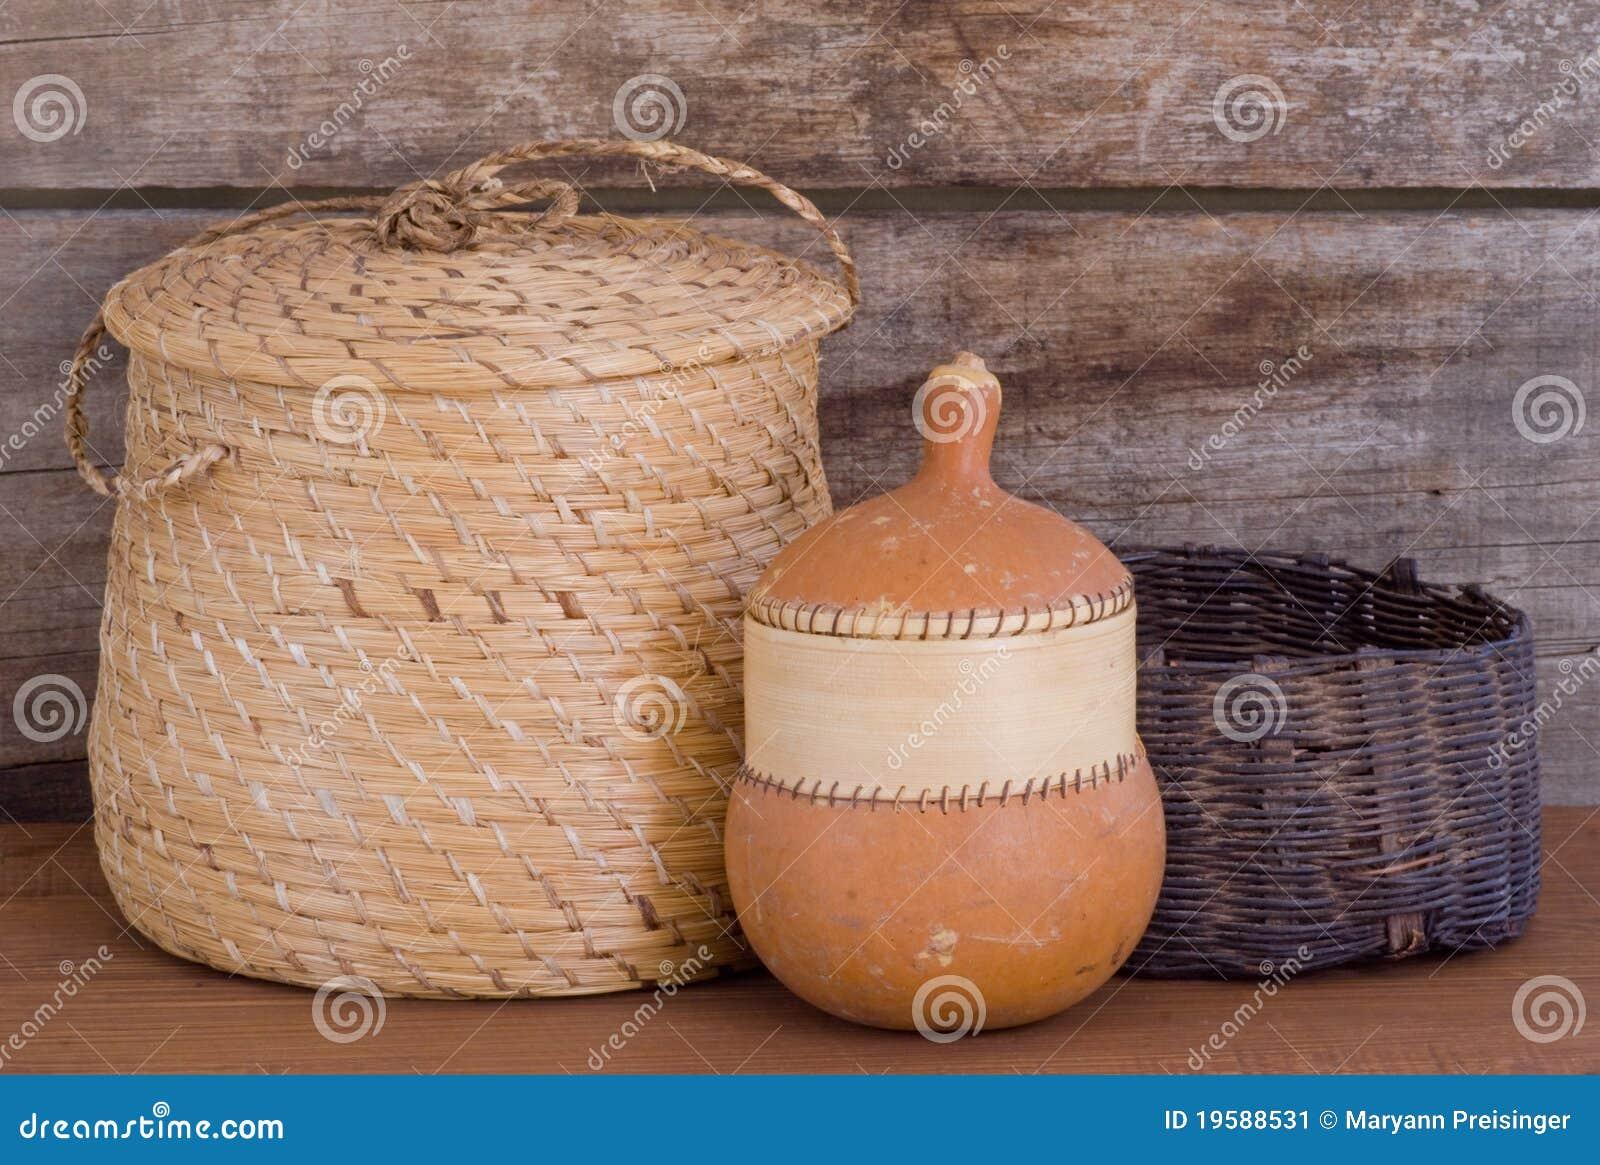 Native Indian weaving baskets gourd on shelf